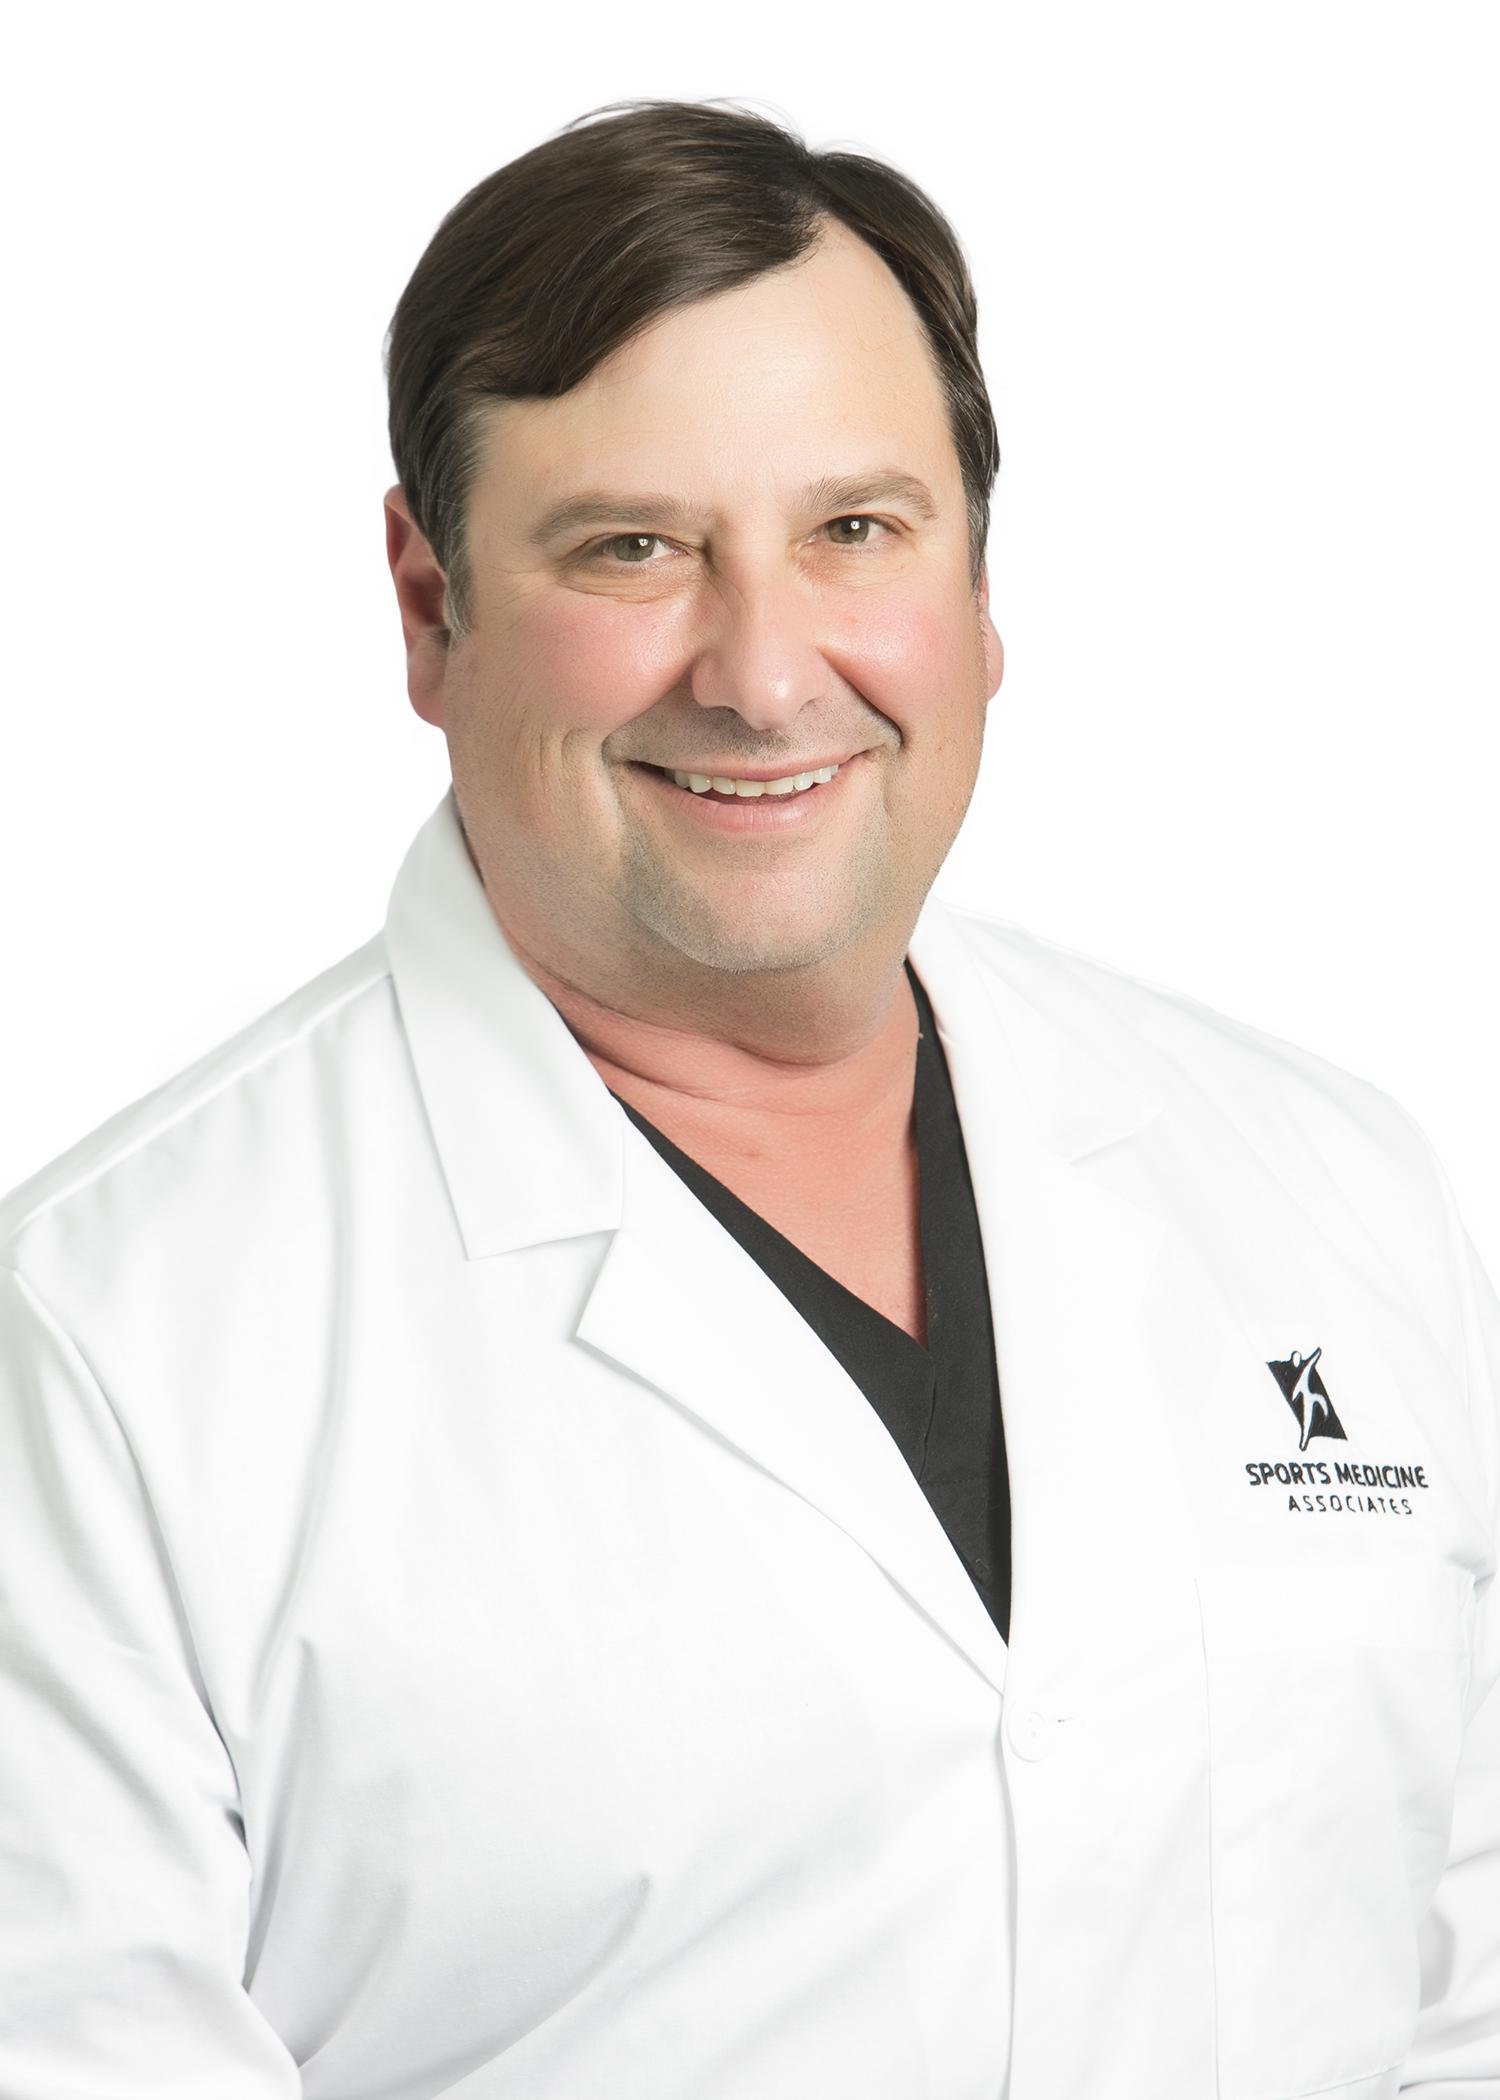 Richard Steffen, M.D - Board Certified Orthopedic Surgeon